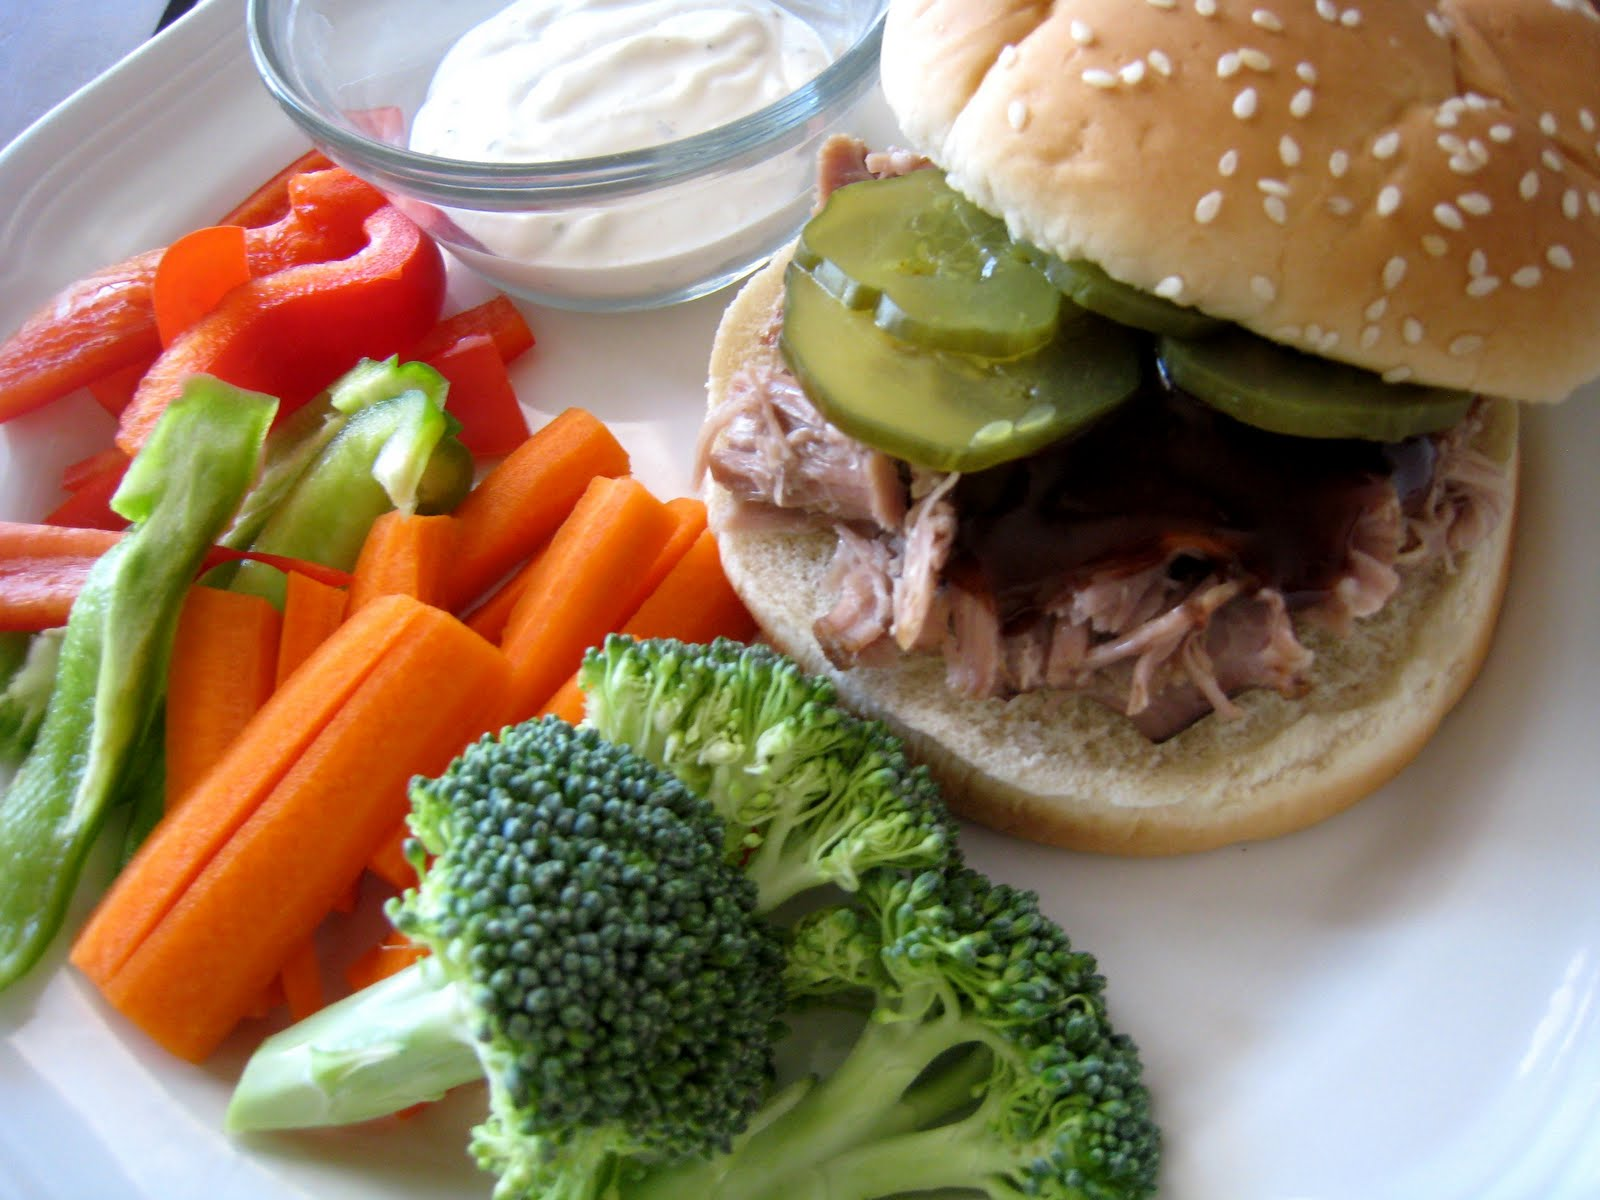 A plate of veggies and BBQ Pork sandwich